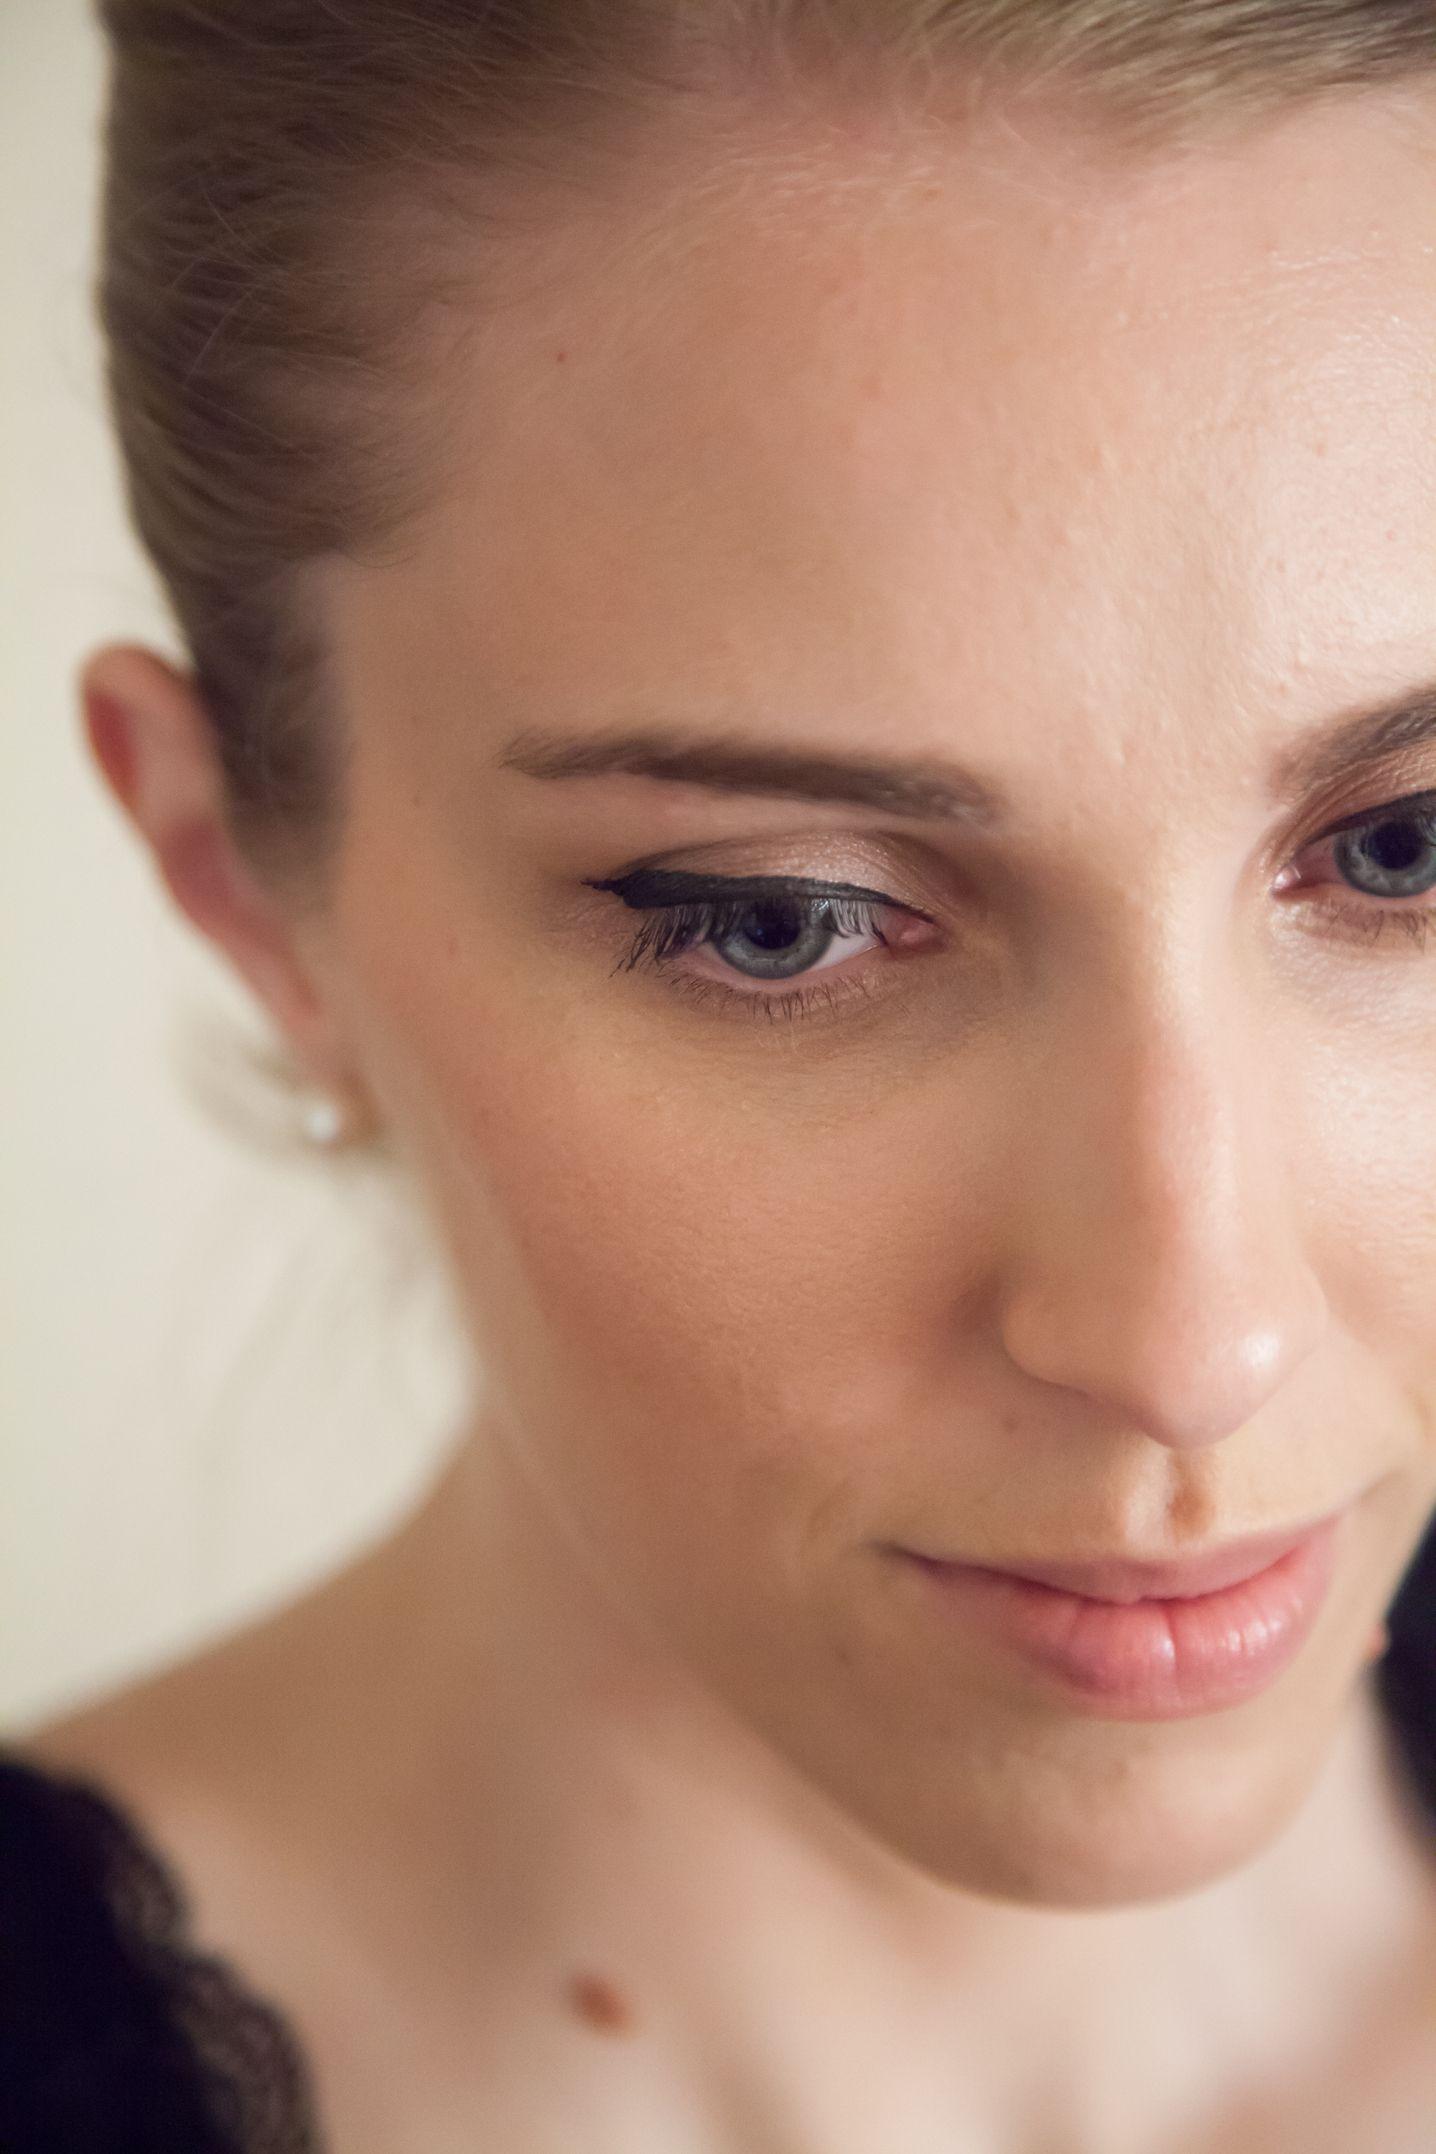 Audrey hepburn everyday full face makeup look using ysl chanel audrey hepburn everyday full face makeup look using ysl chanel and lorac products baditri Gallery